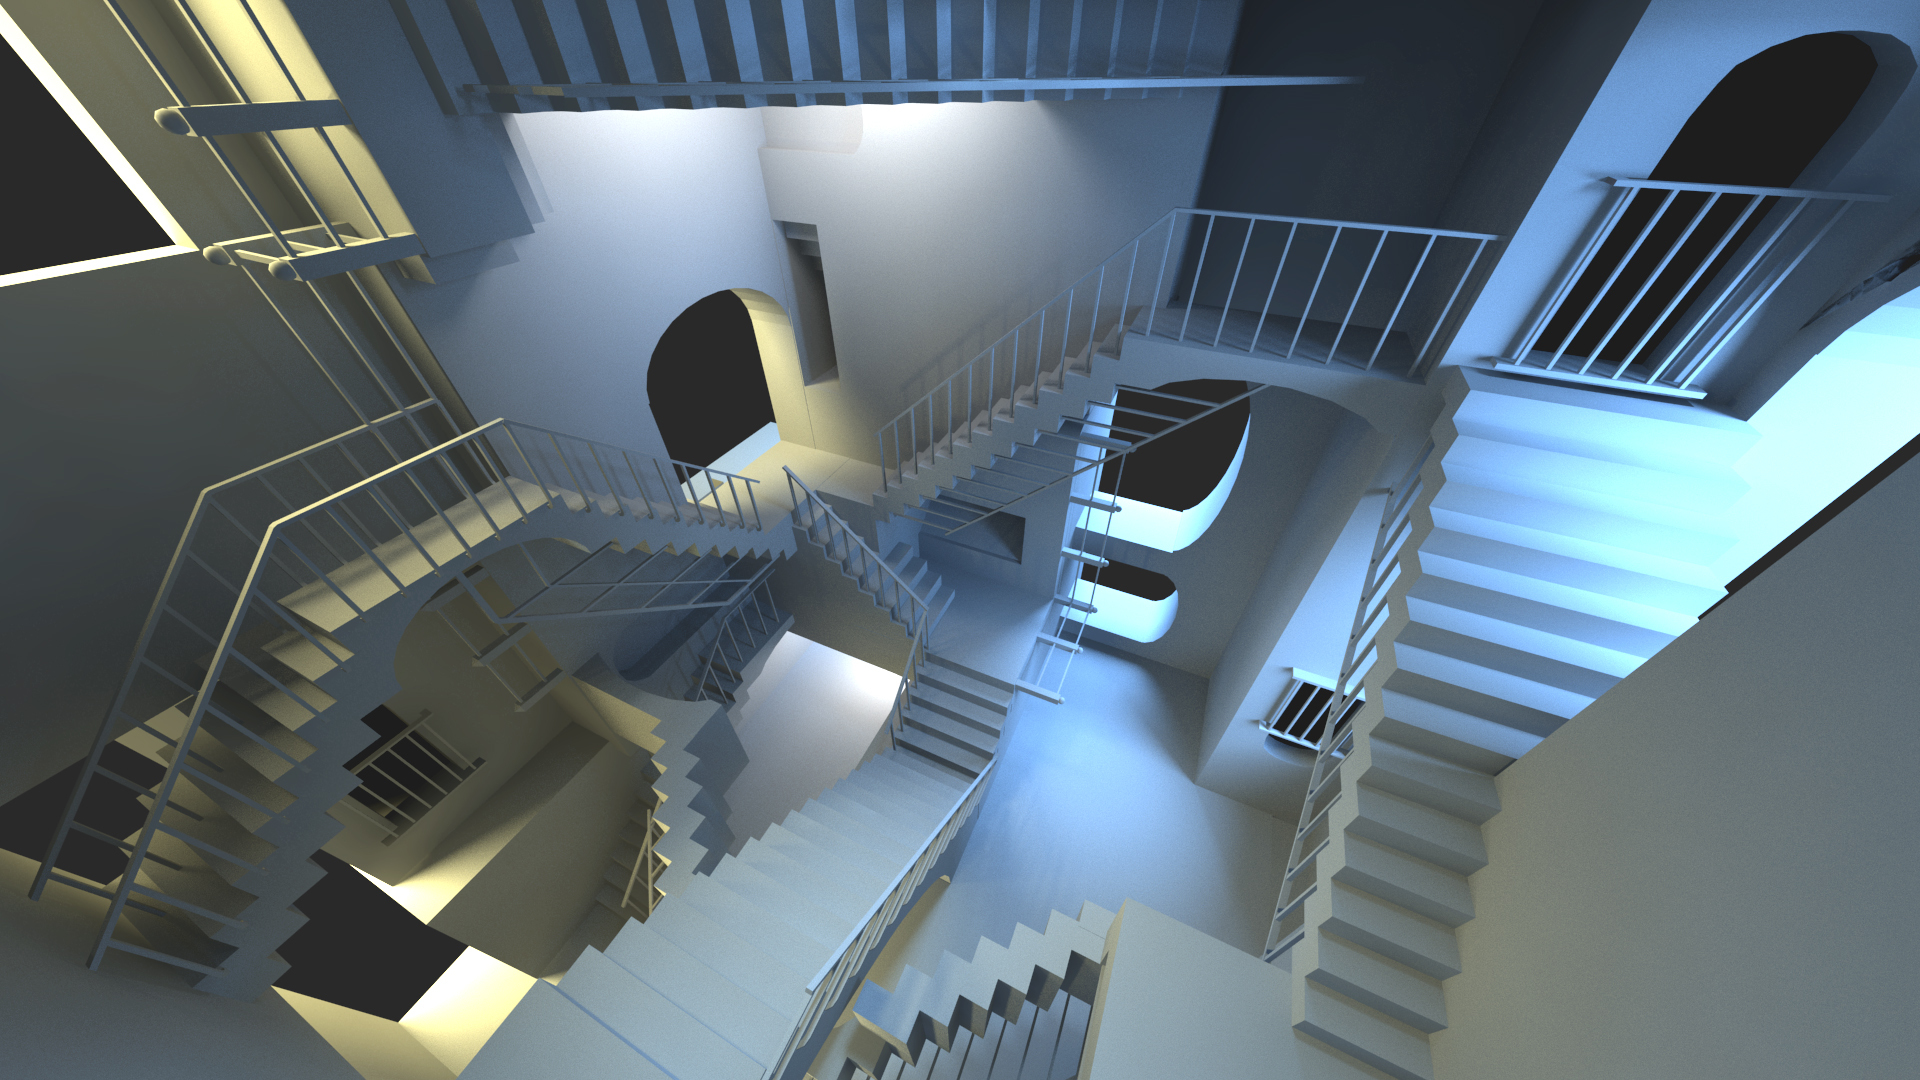 Escher stairs - Unity VR project - Work in Progress [WIP